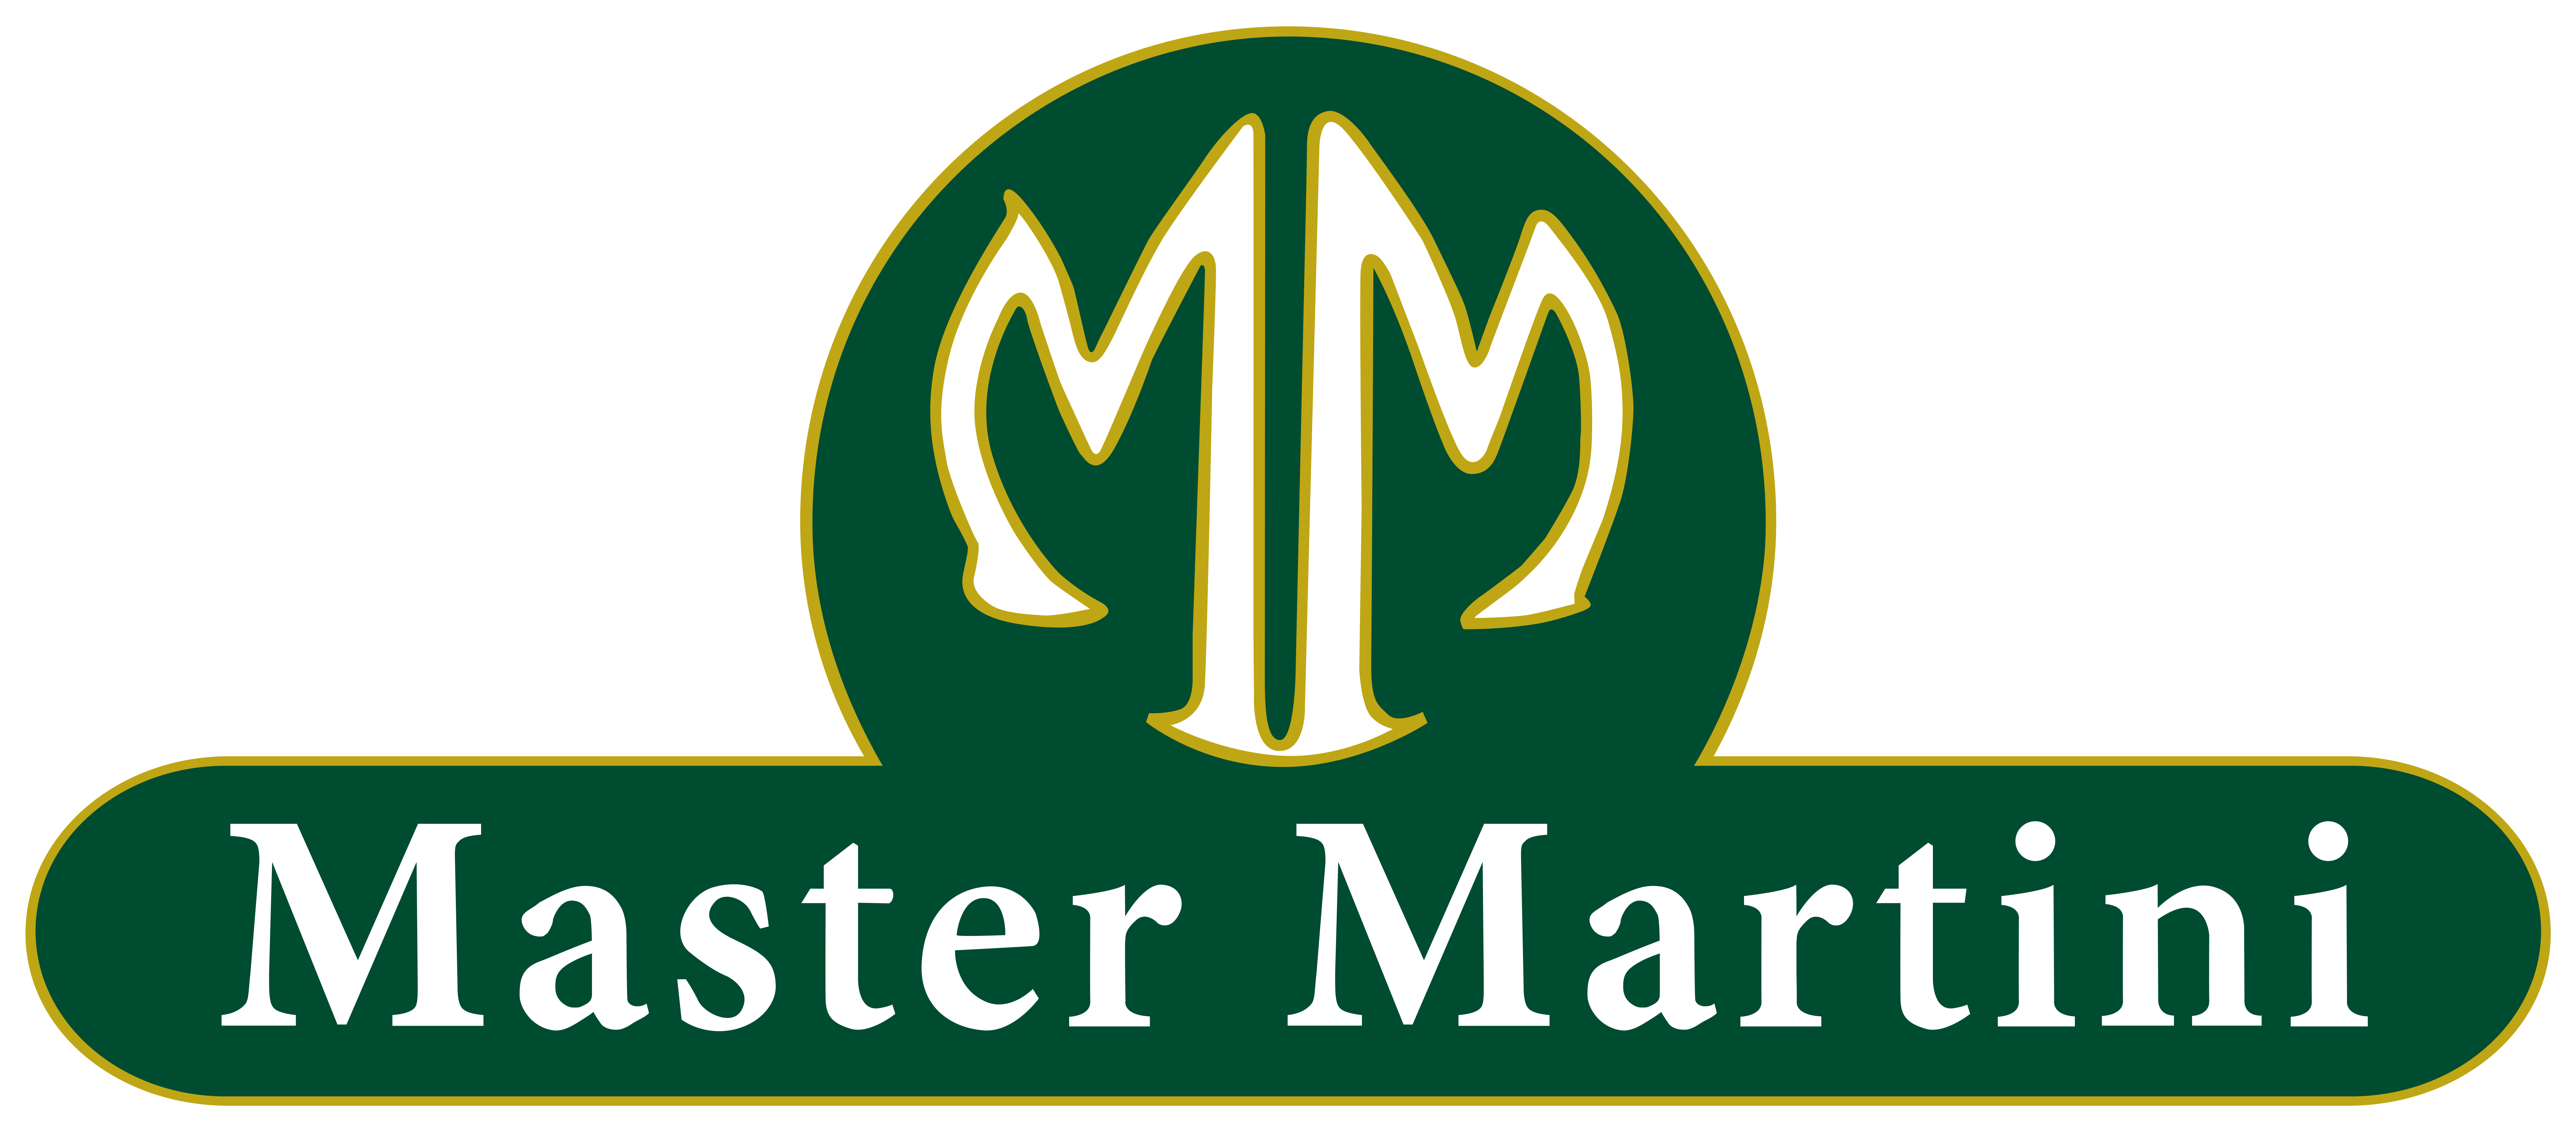 Master Martinic